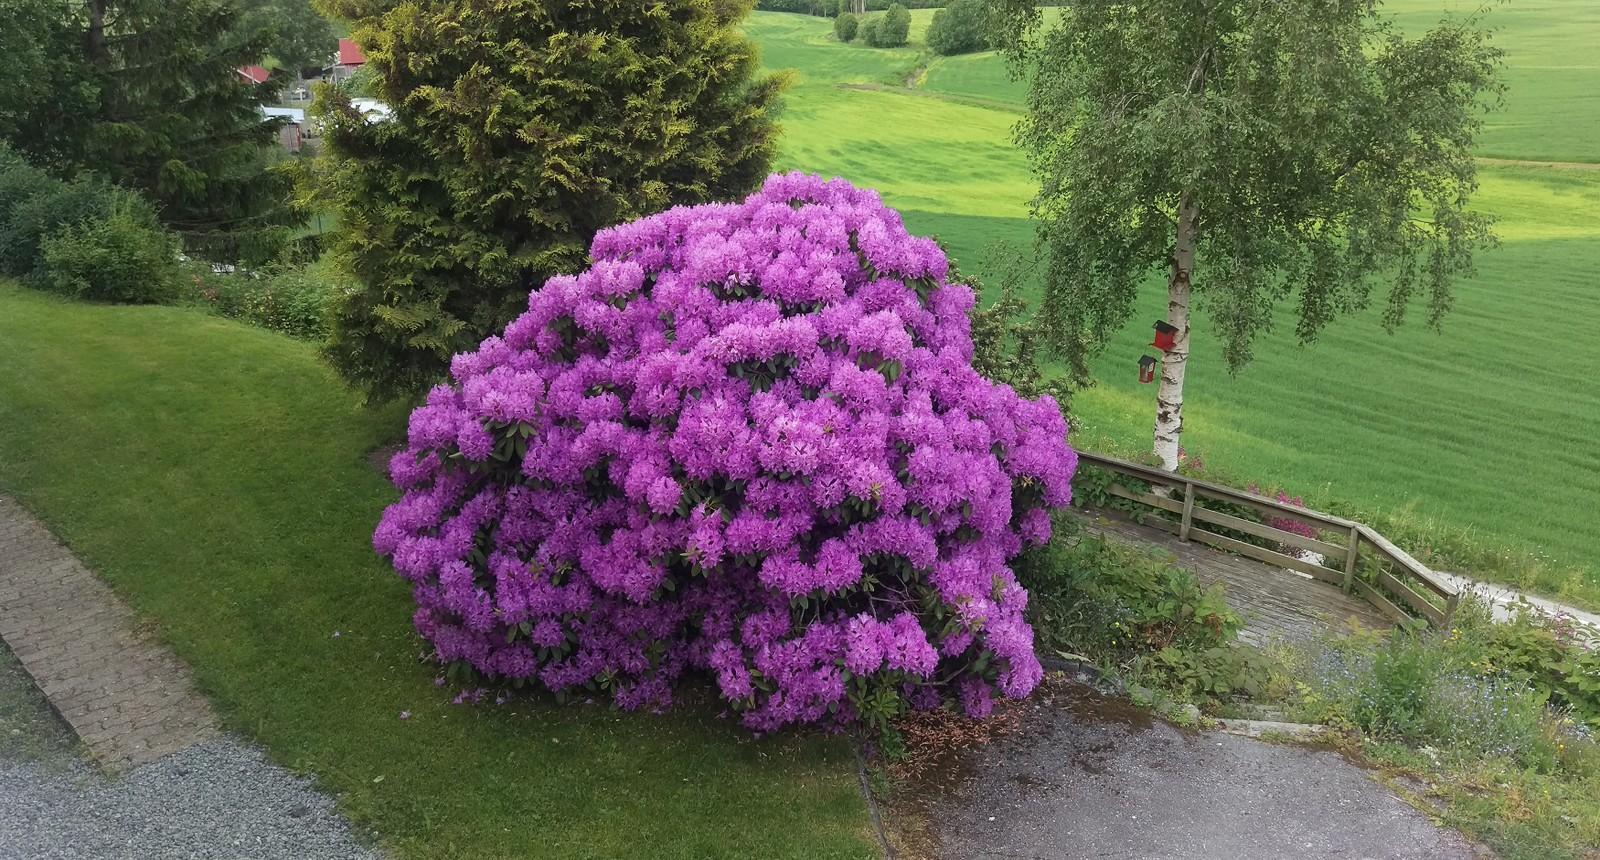 Rhododendron ved fylkesvei 470 i Skaun